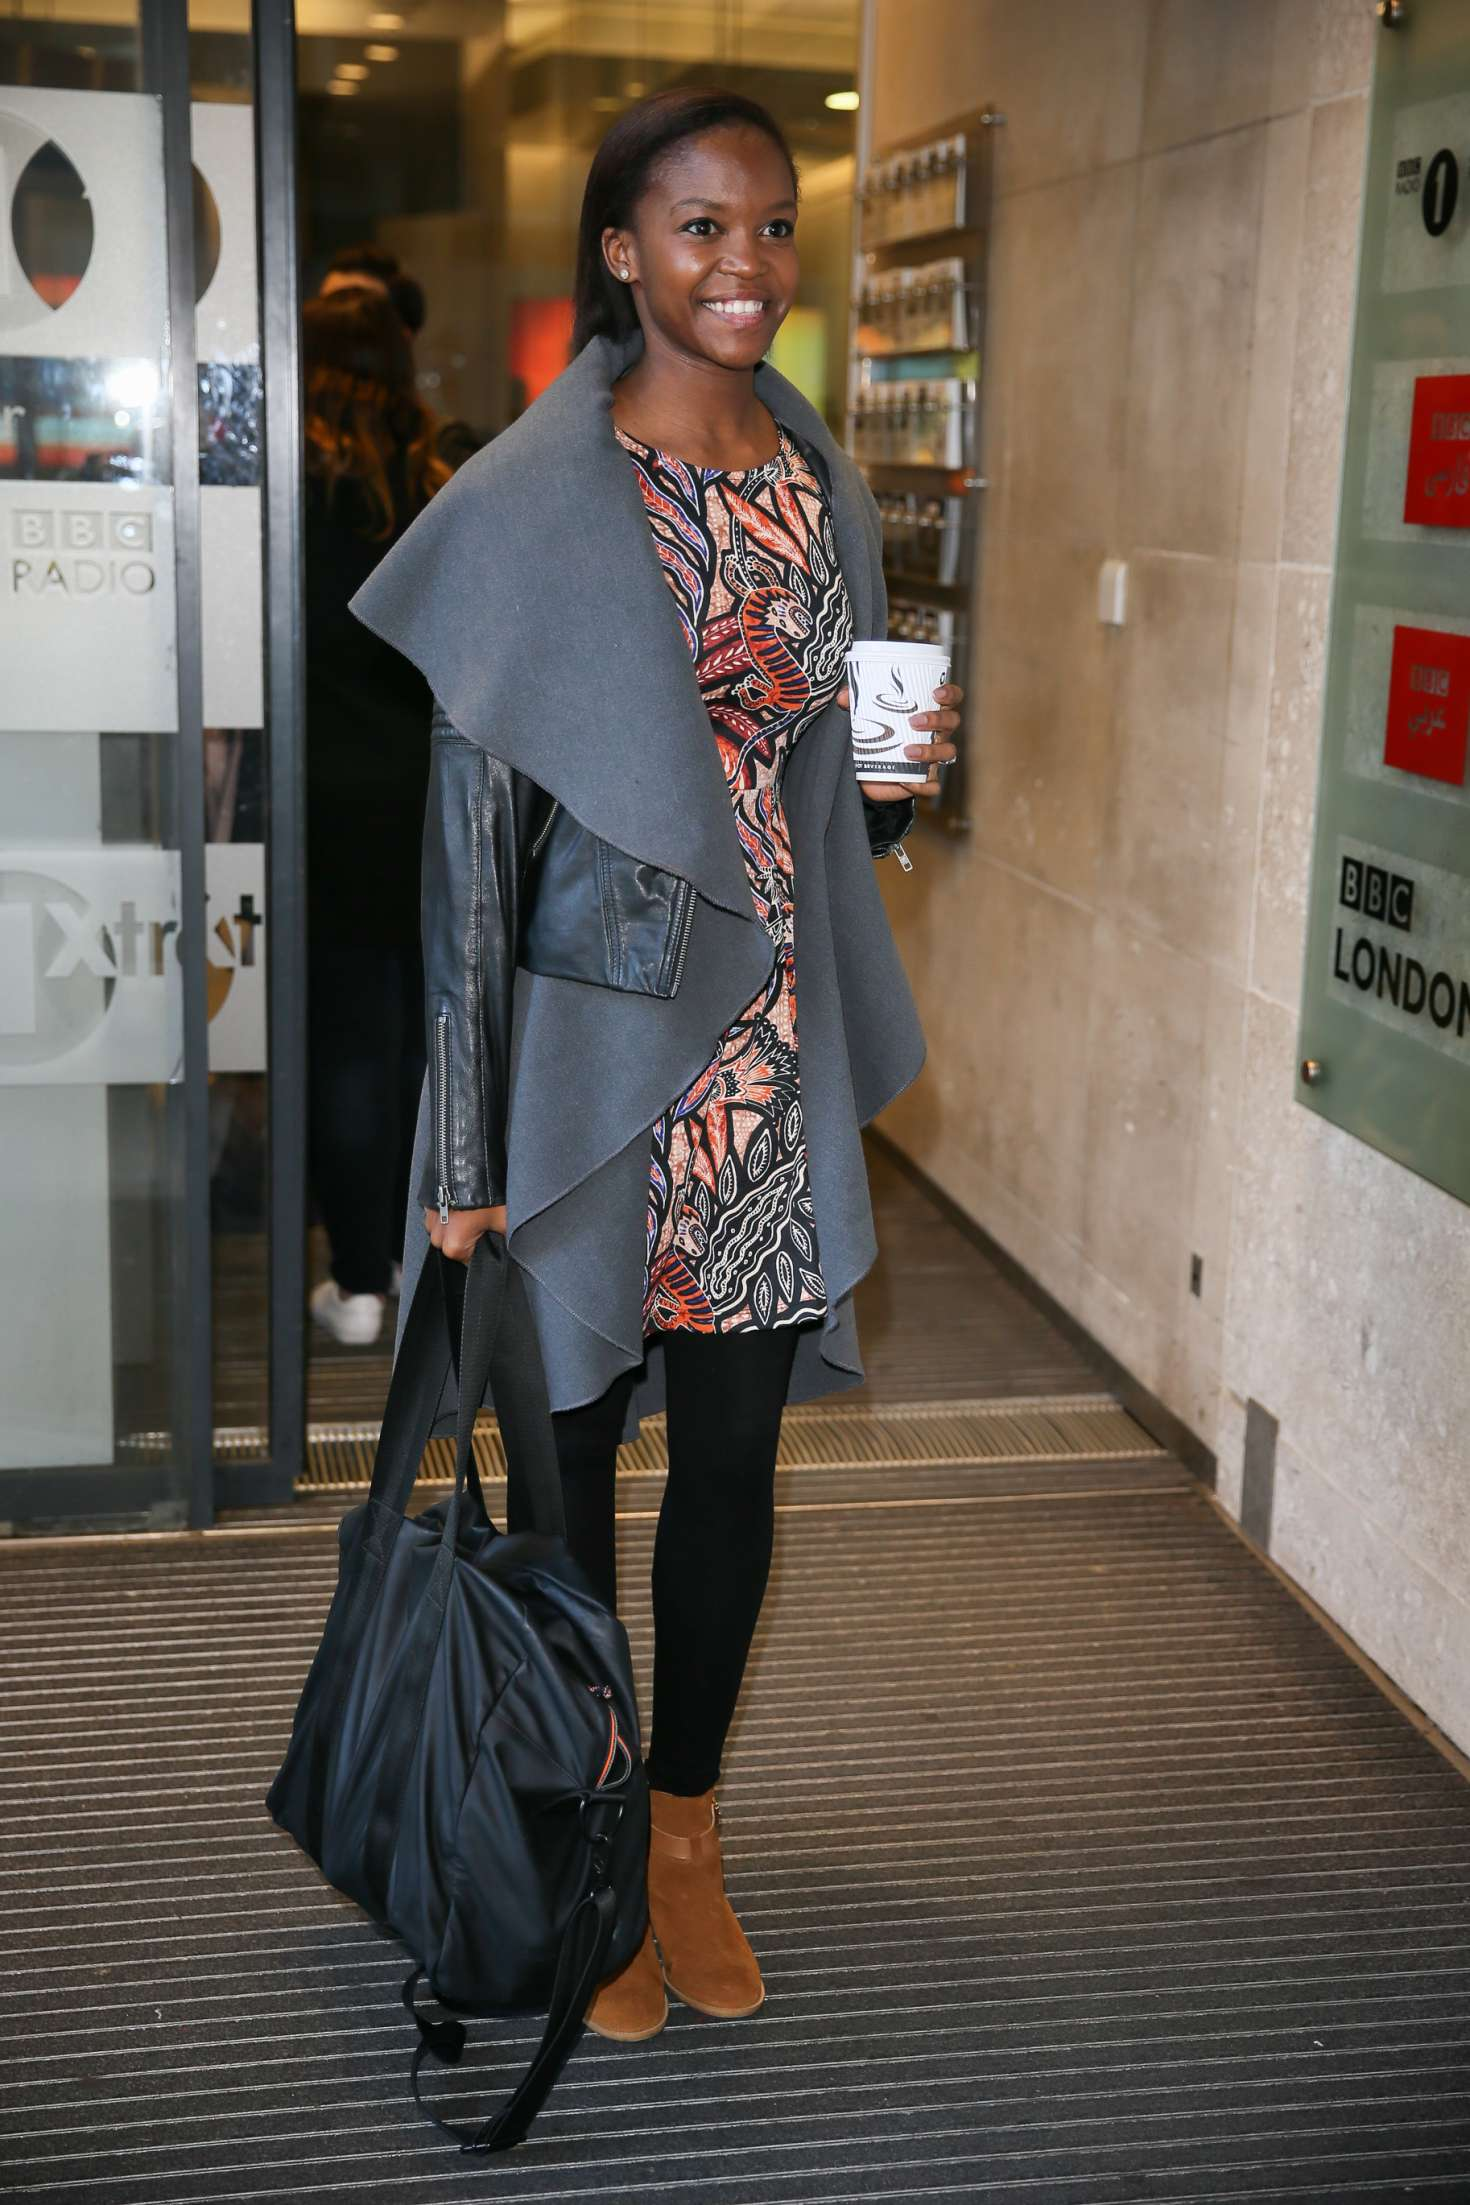 Otlile Mabuse Leaving BBC Radio One Studios in London